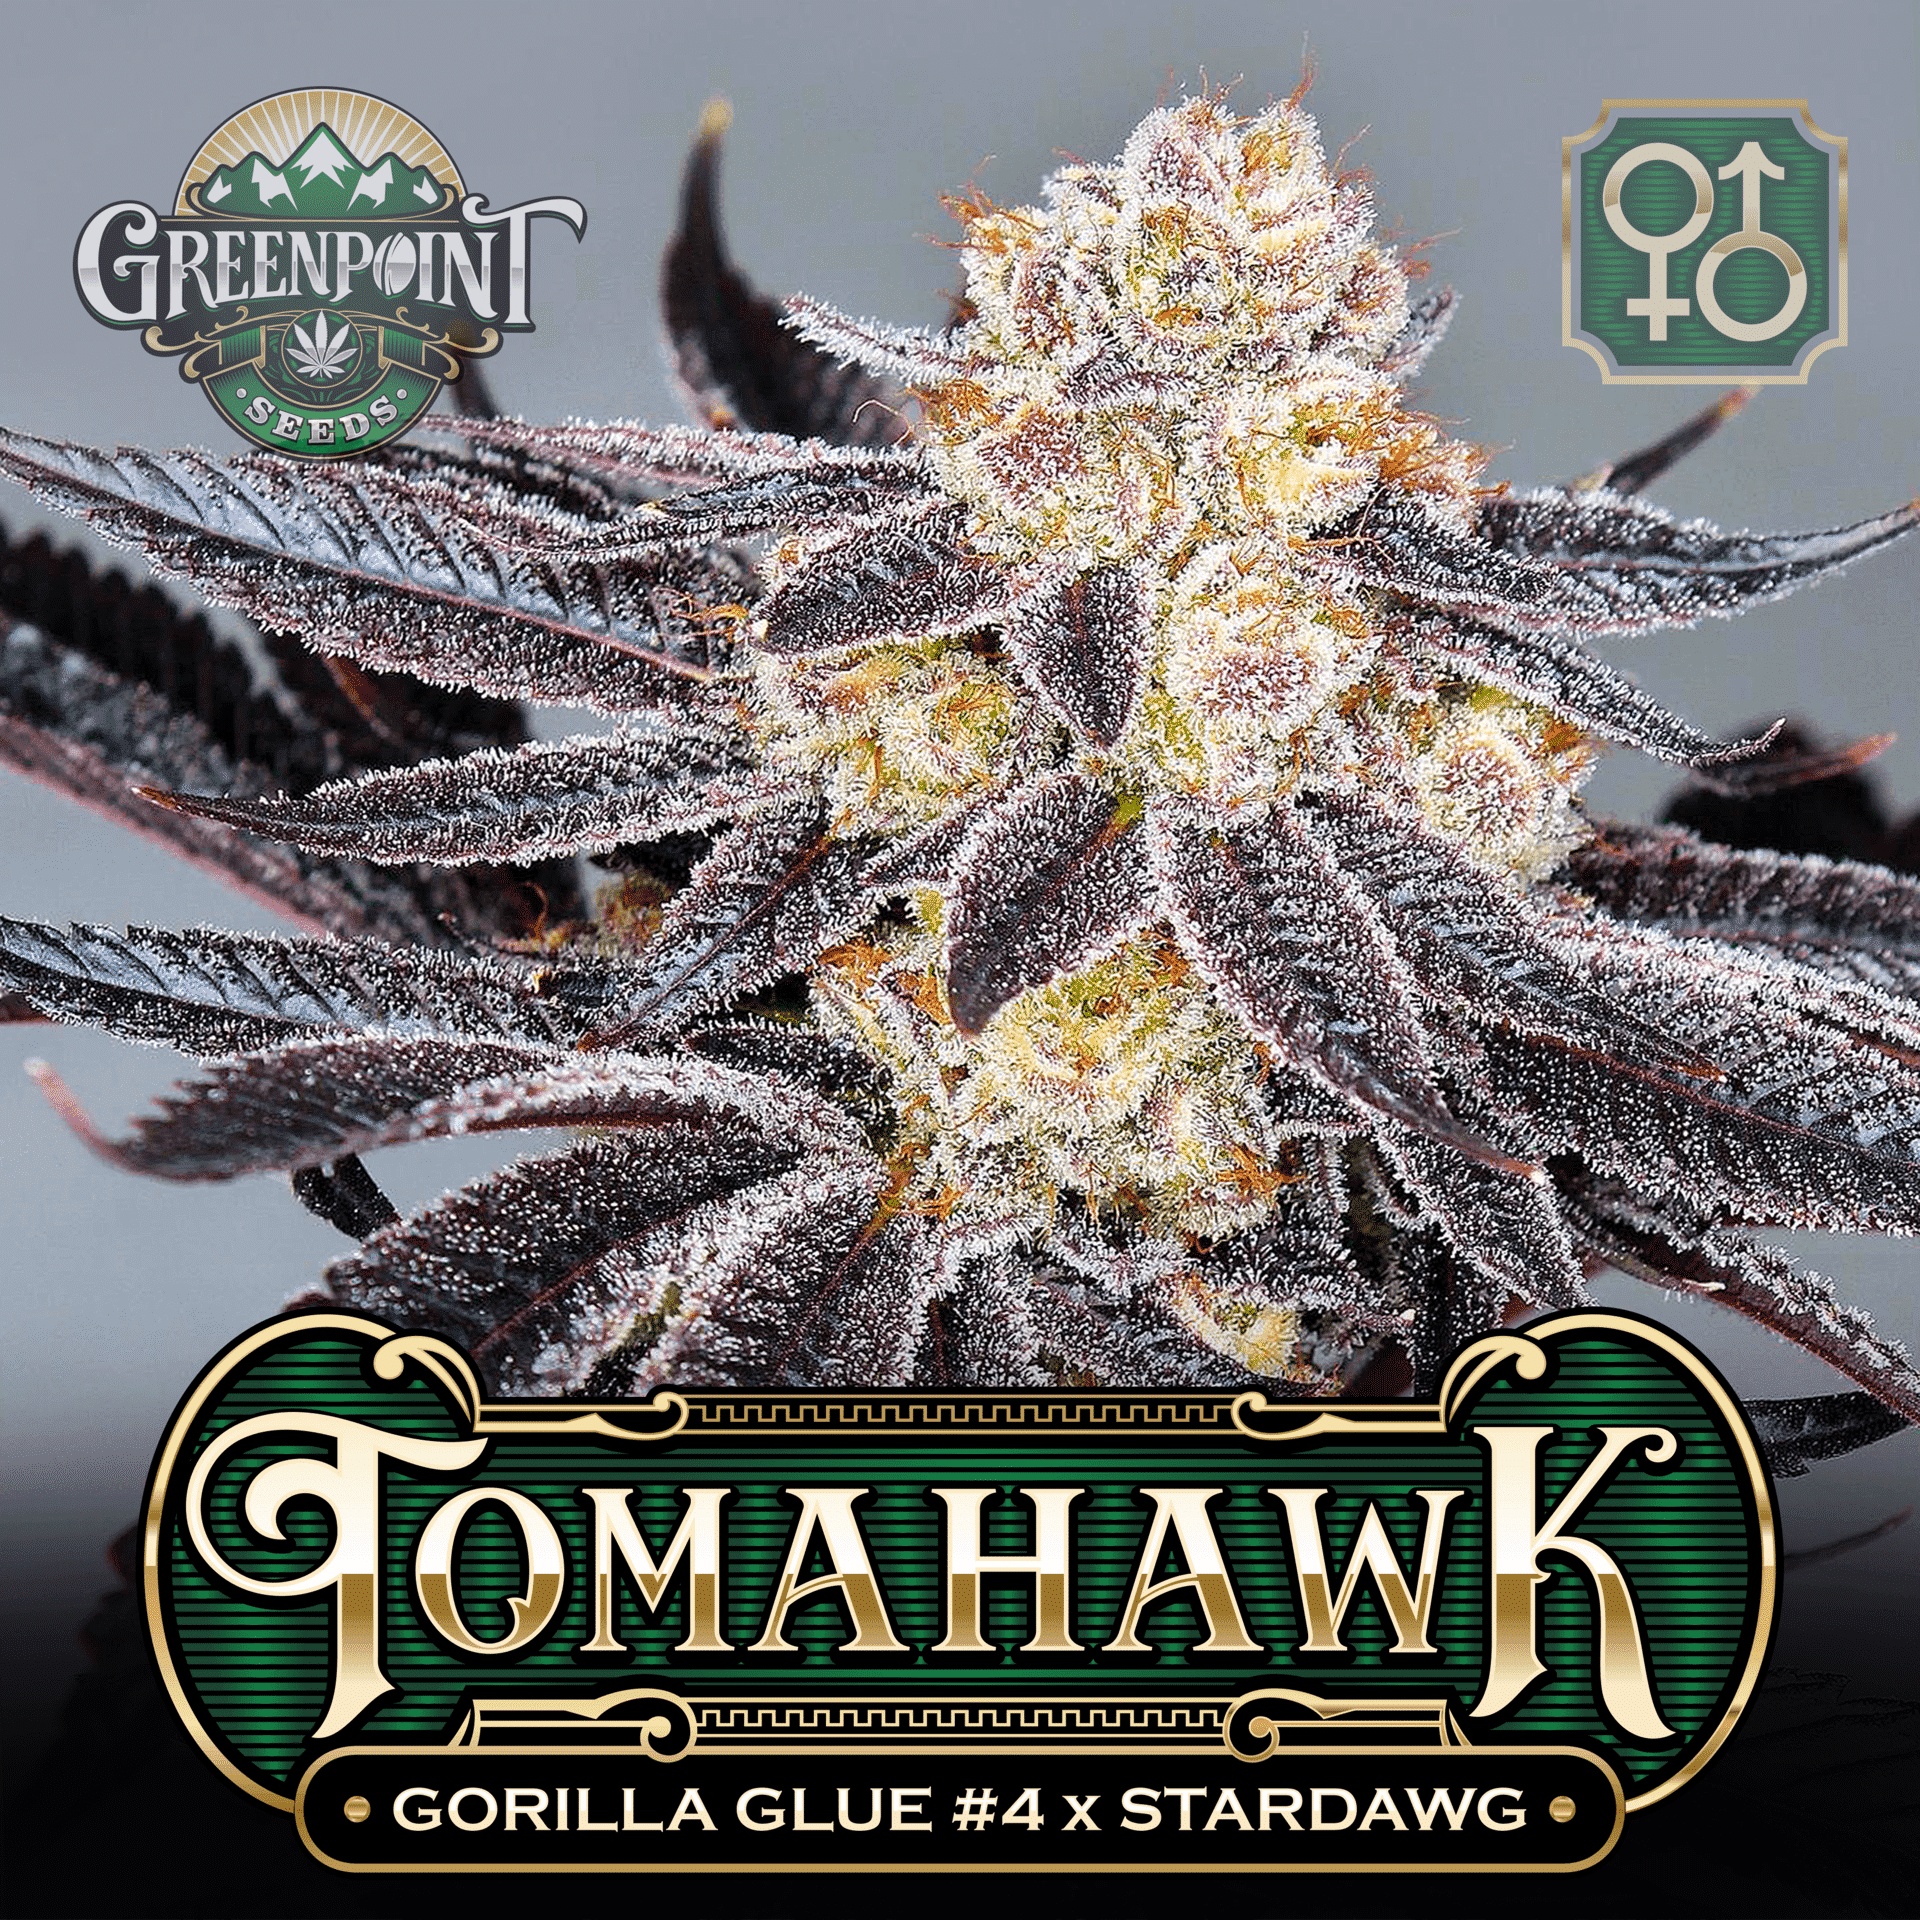 Tomahawk Seeds - Gorilla Glue #4 x Stardawg Strain | Greenpoint Seeds